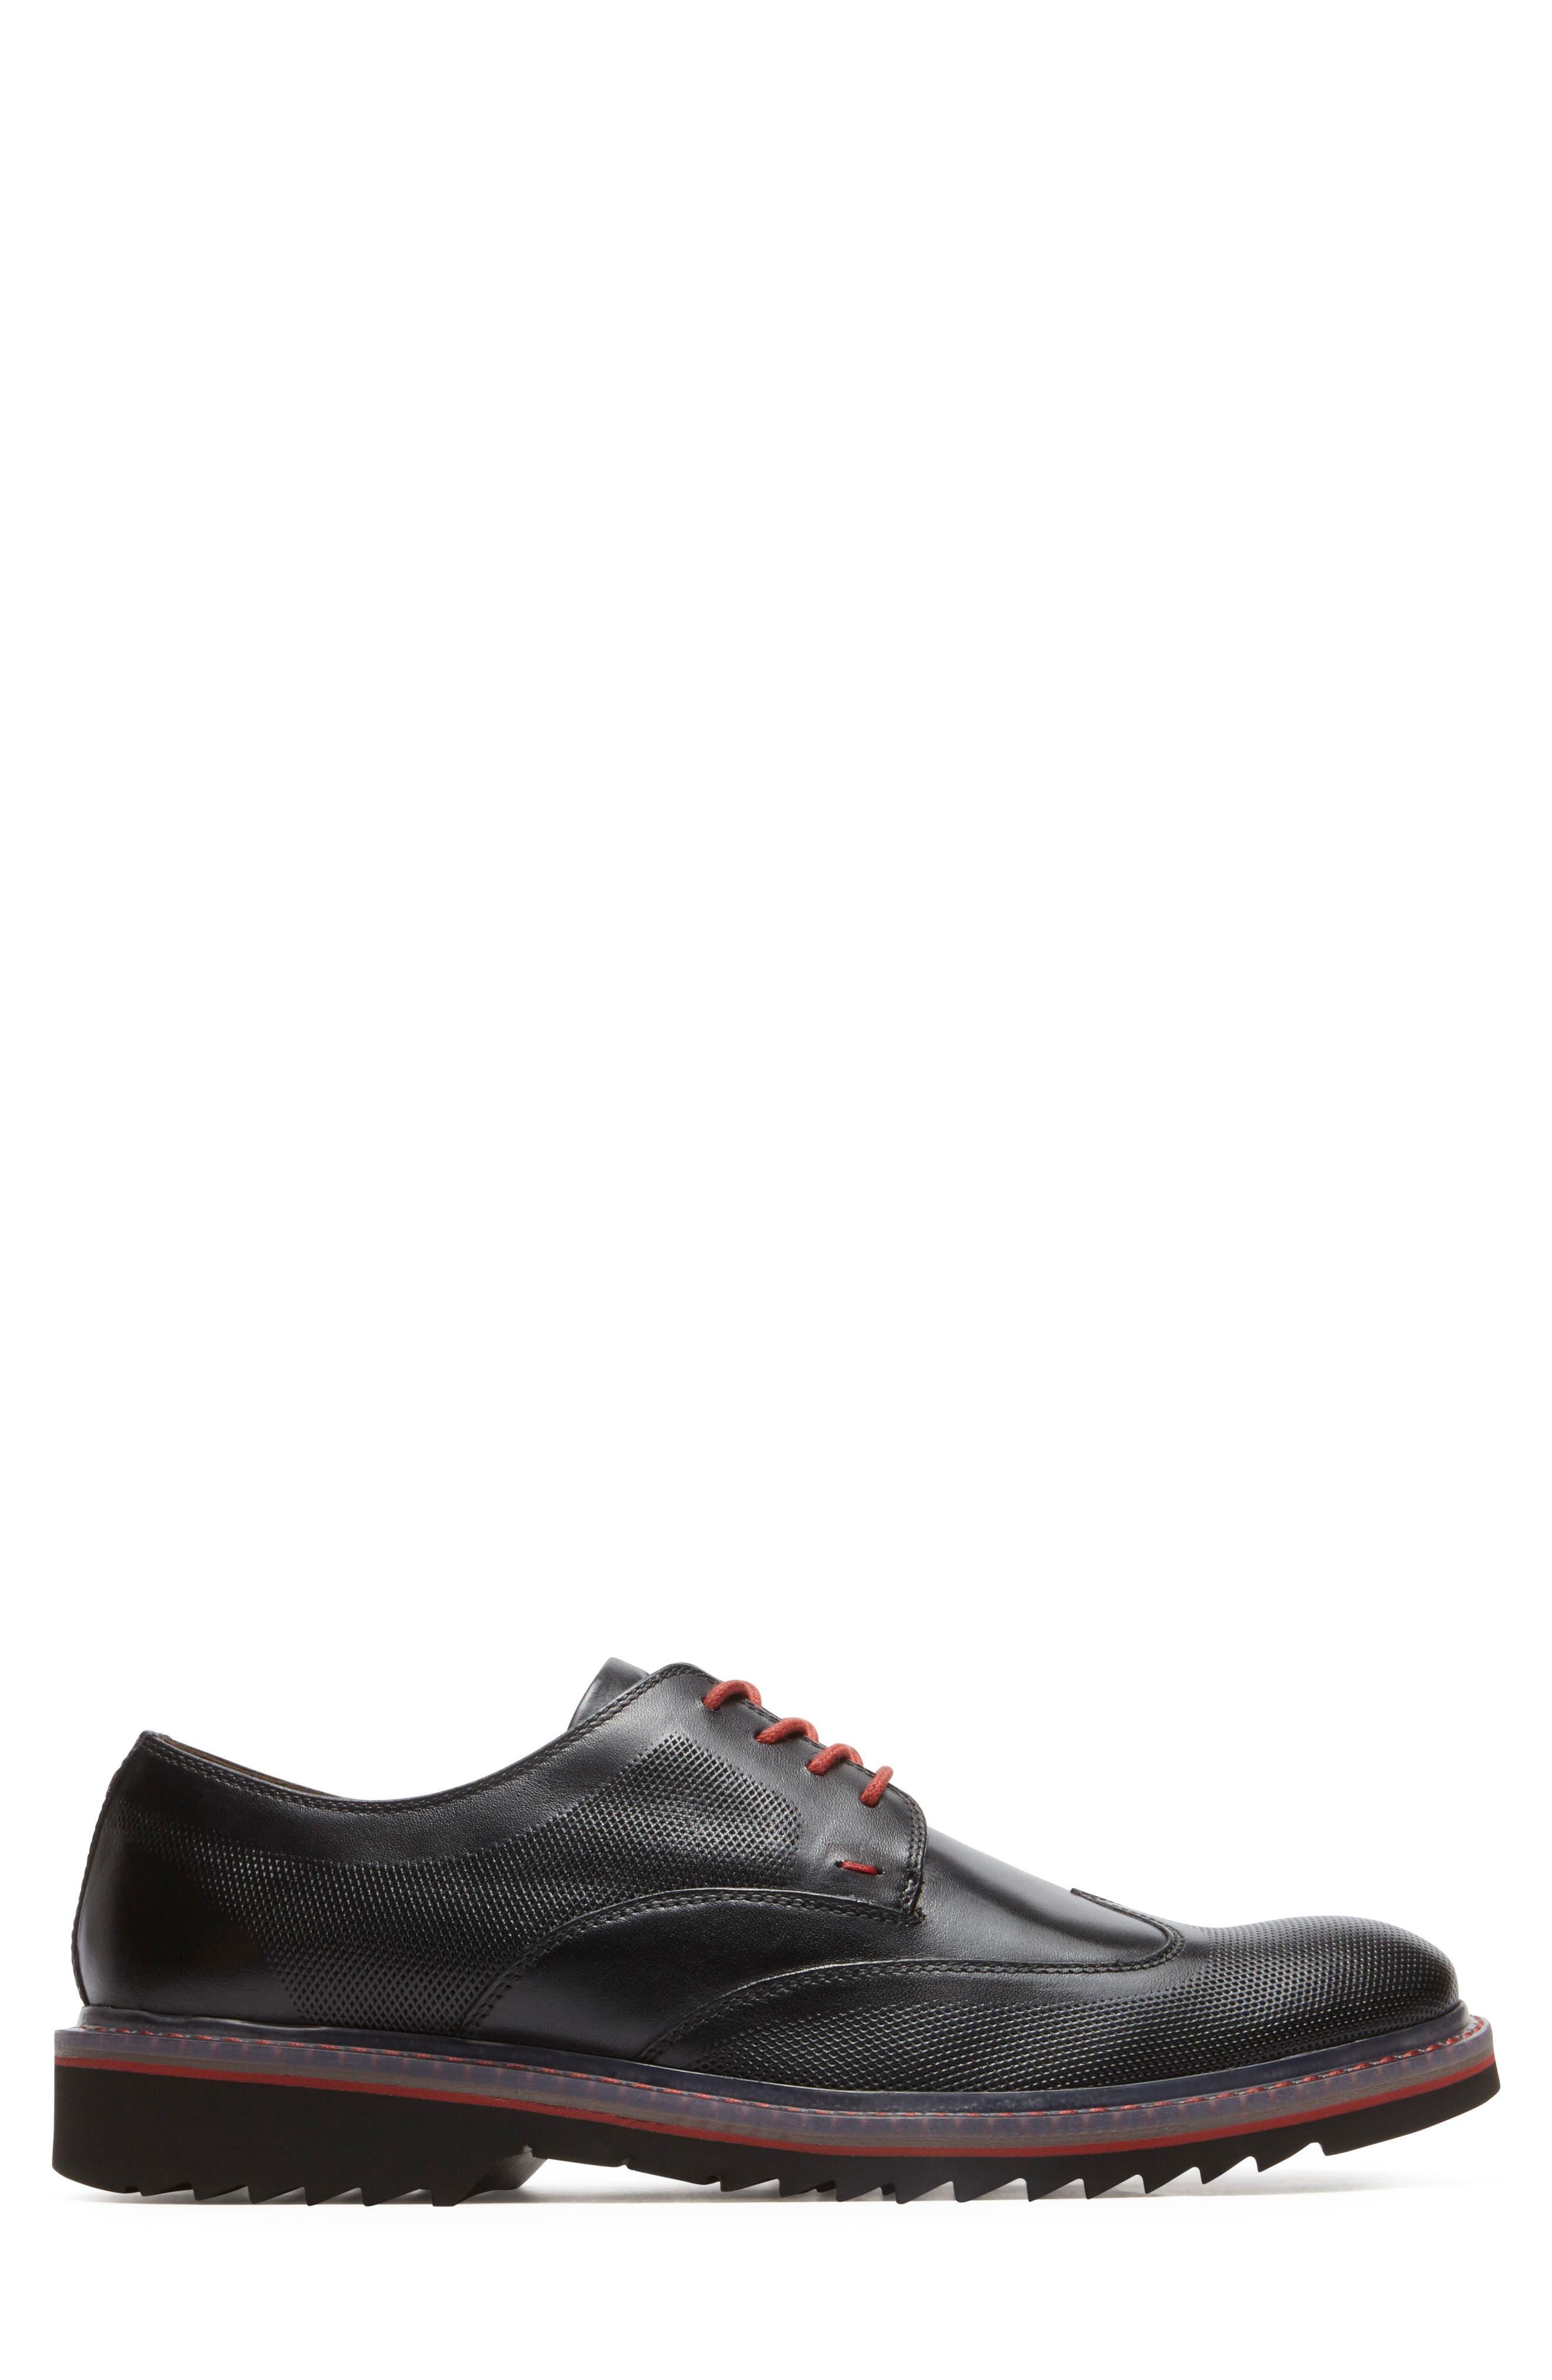 Jaxson Wingtip,                             Alternate thumbnail 3, color,                             Black Leather